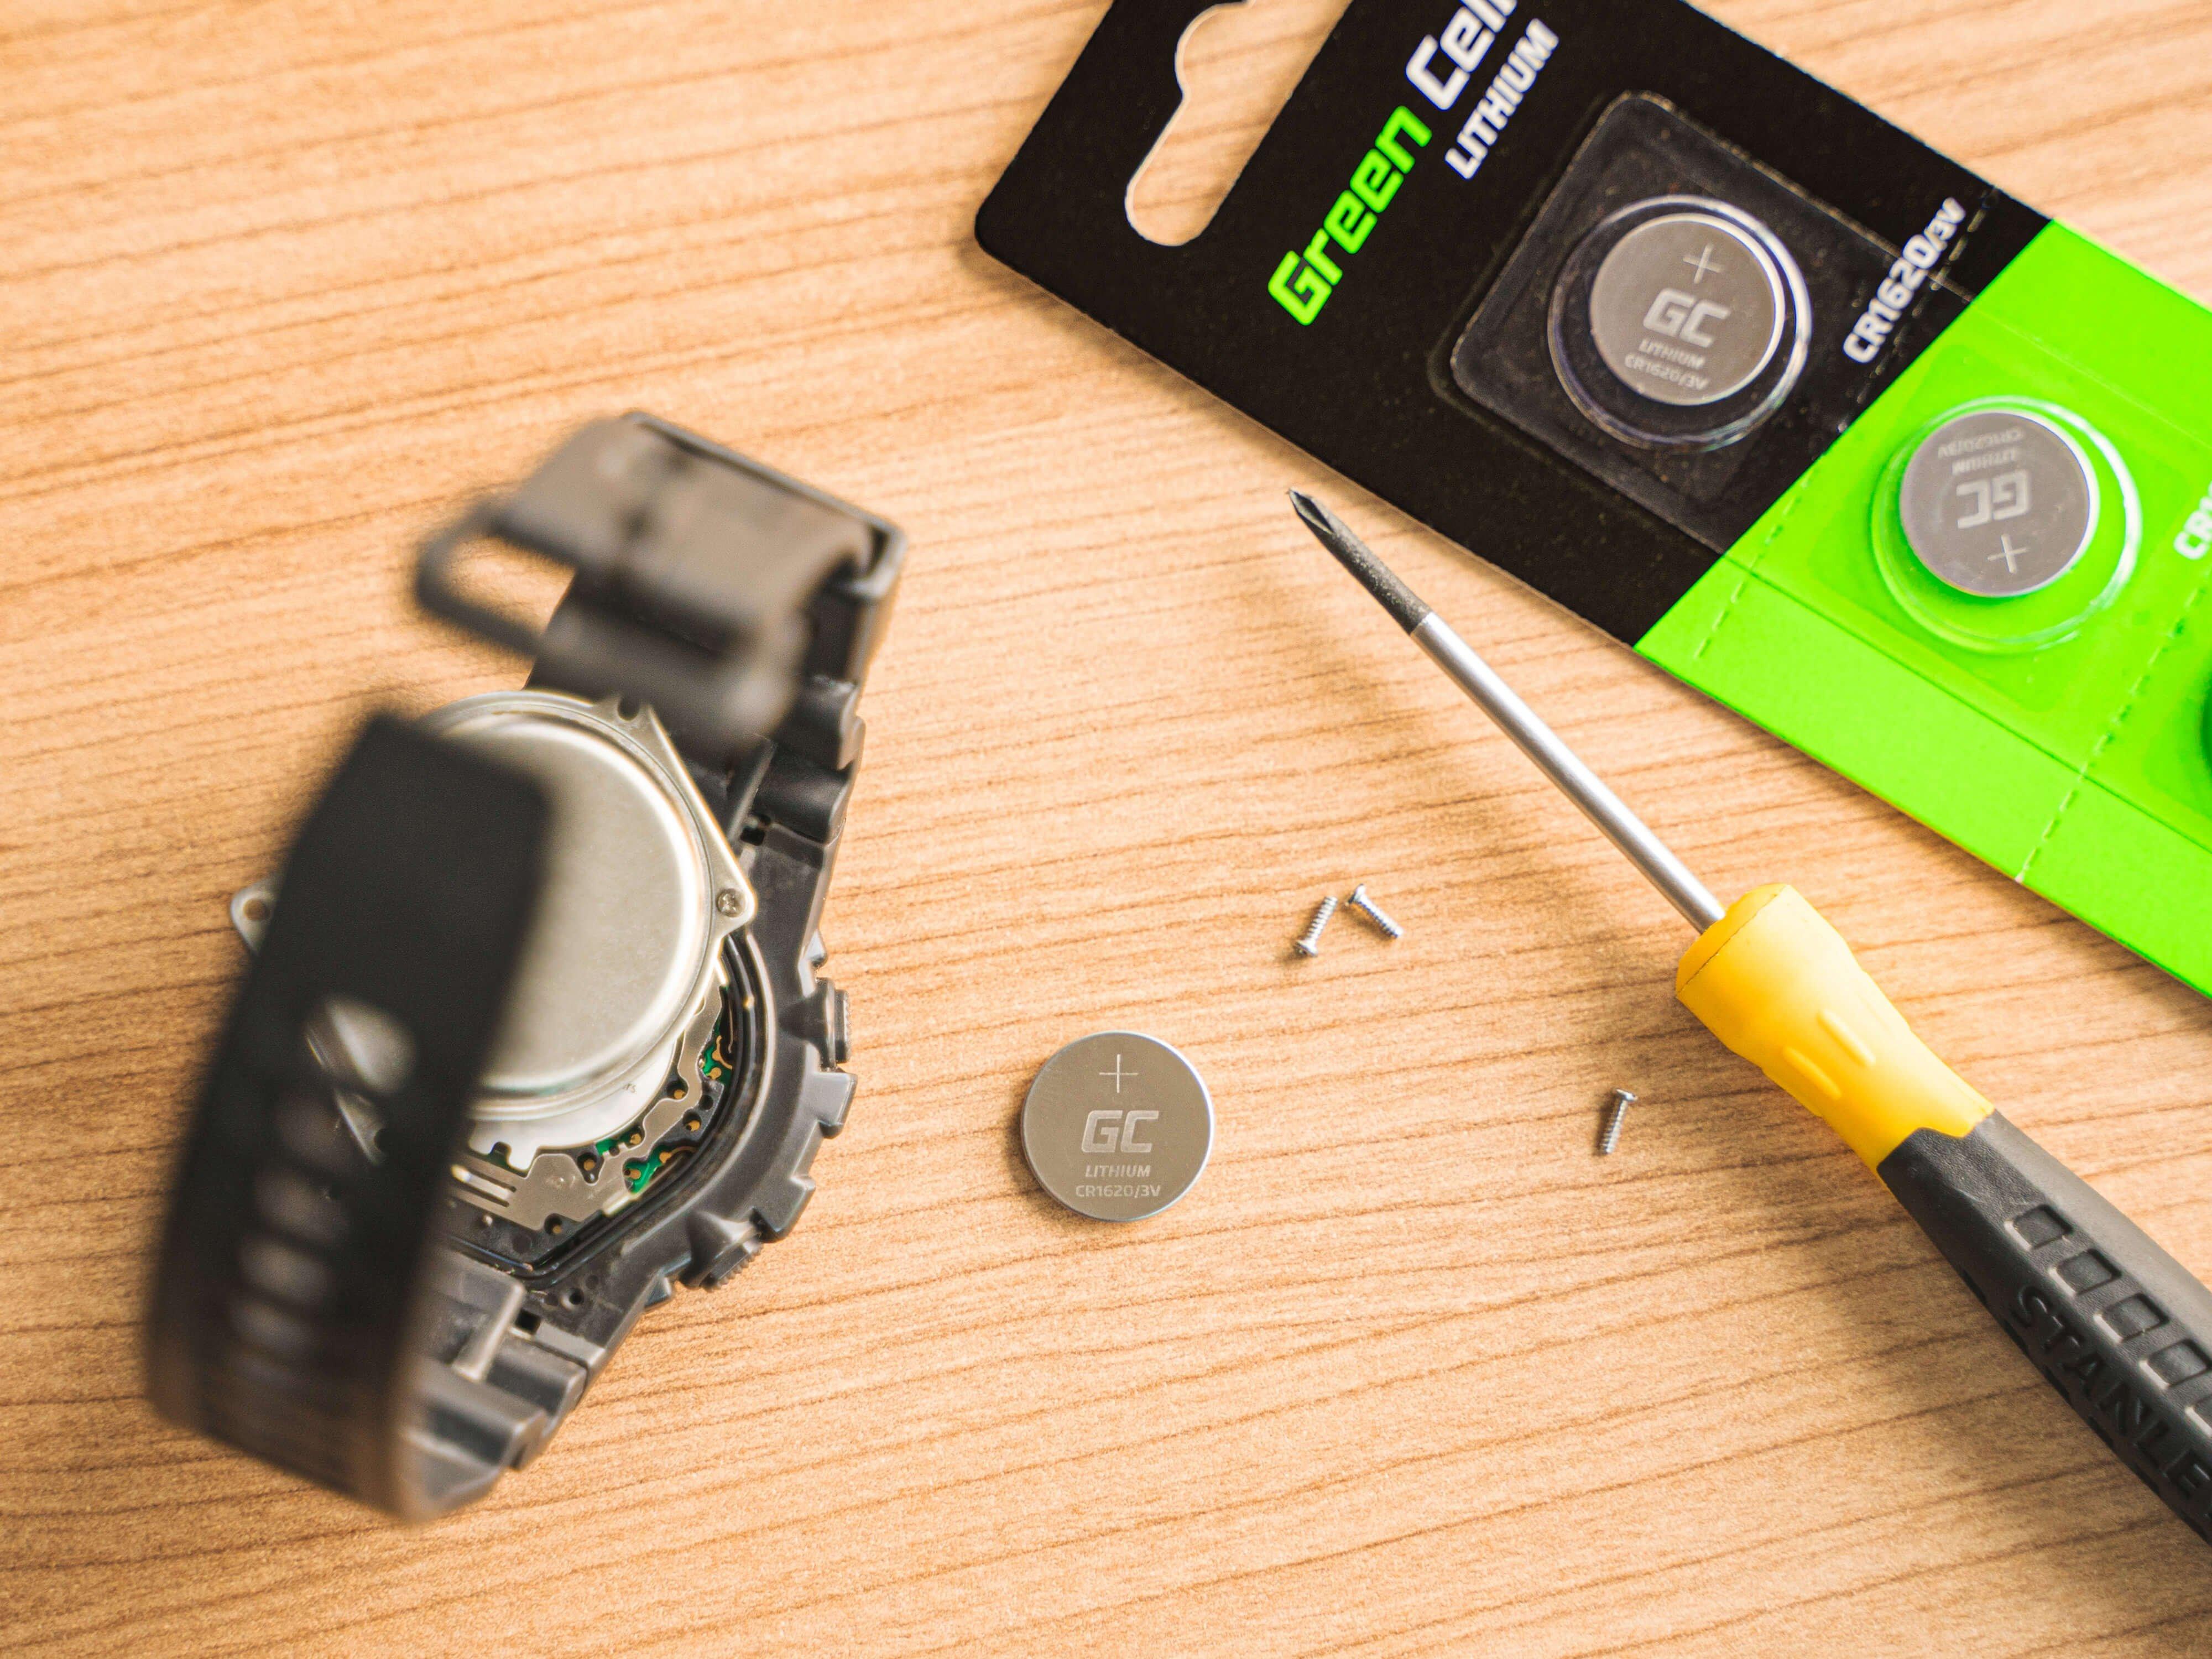 5x litium CR2032 3V 220mAh batterier